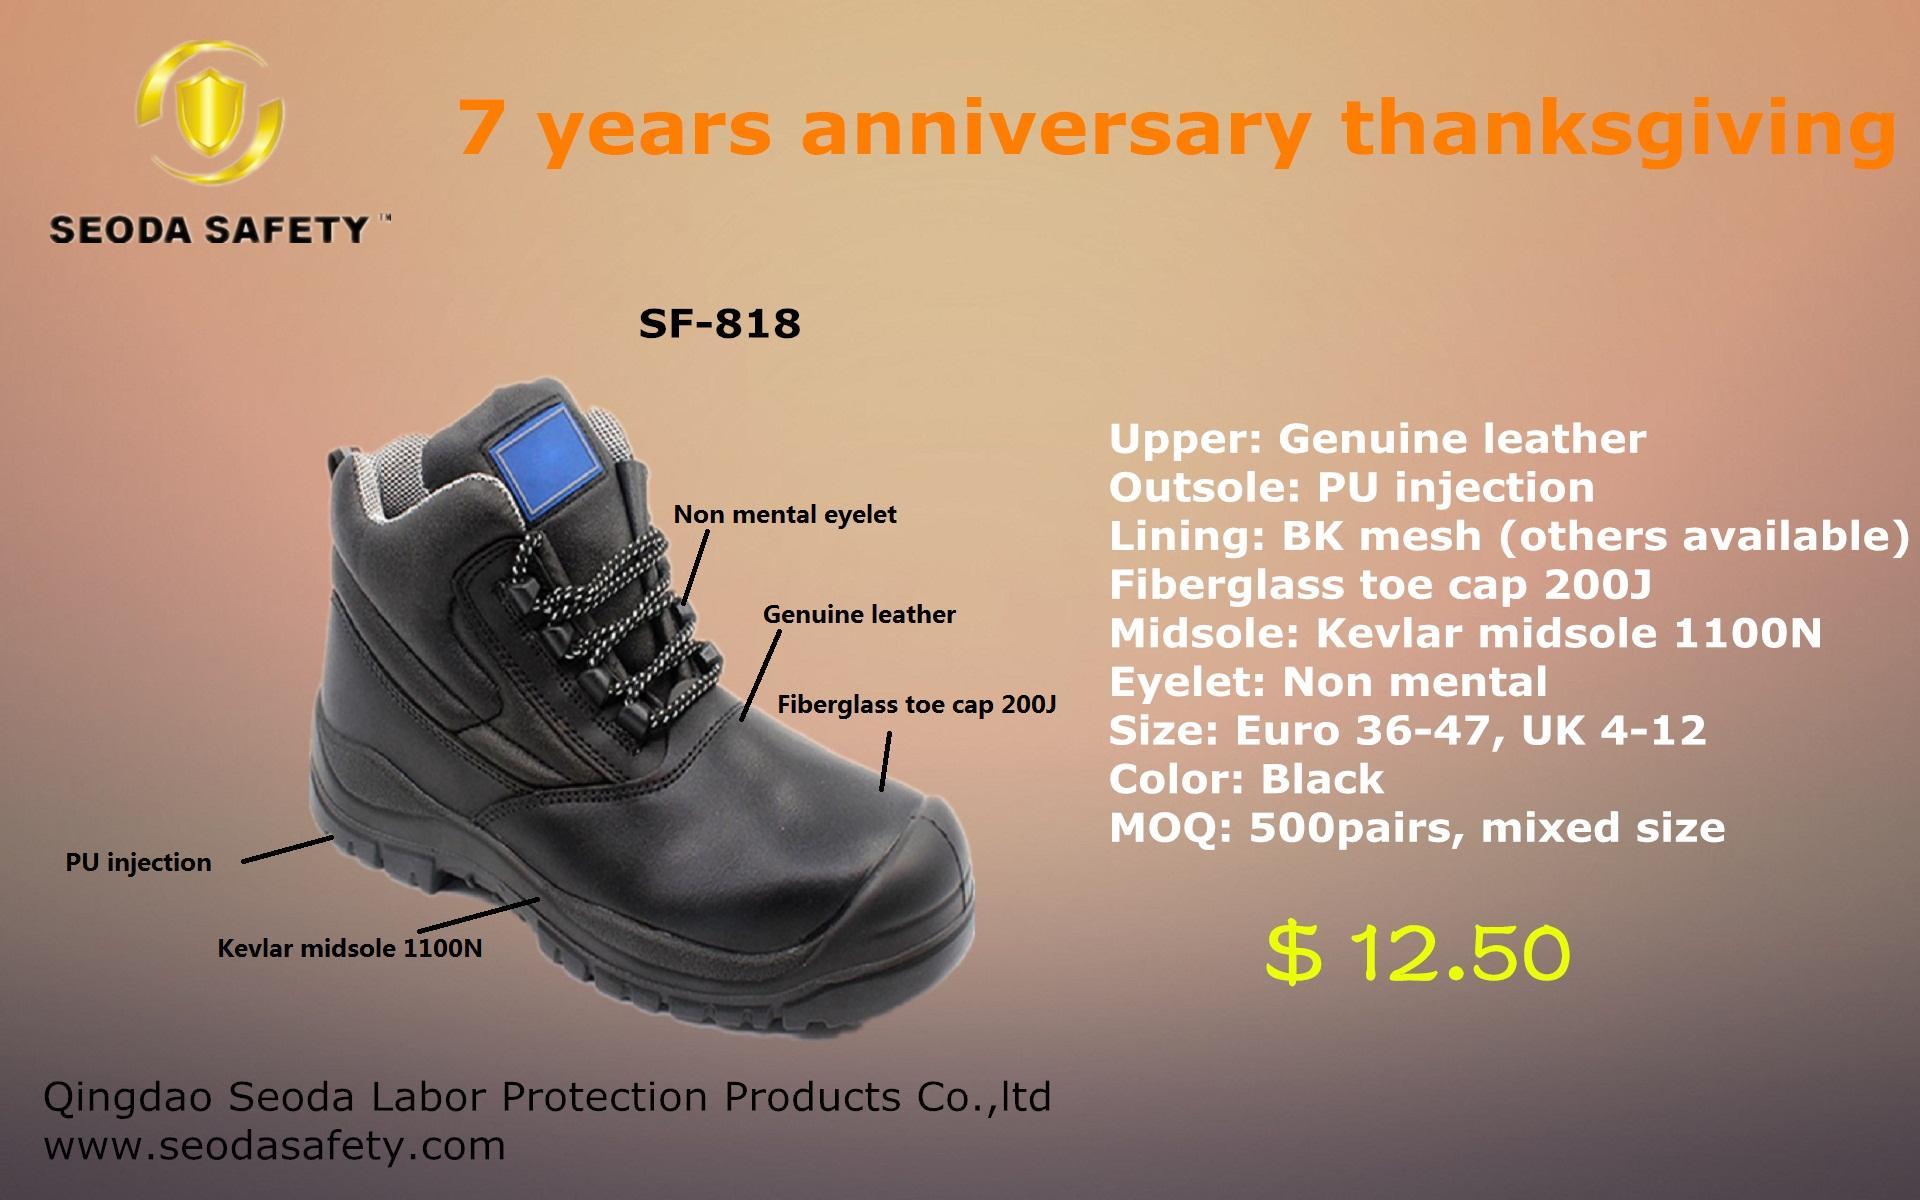 Fiberglass toe cap safety shoes 1